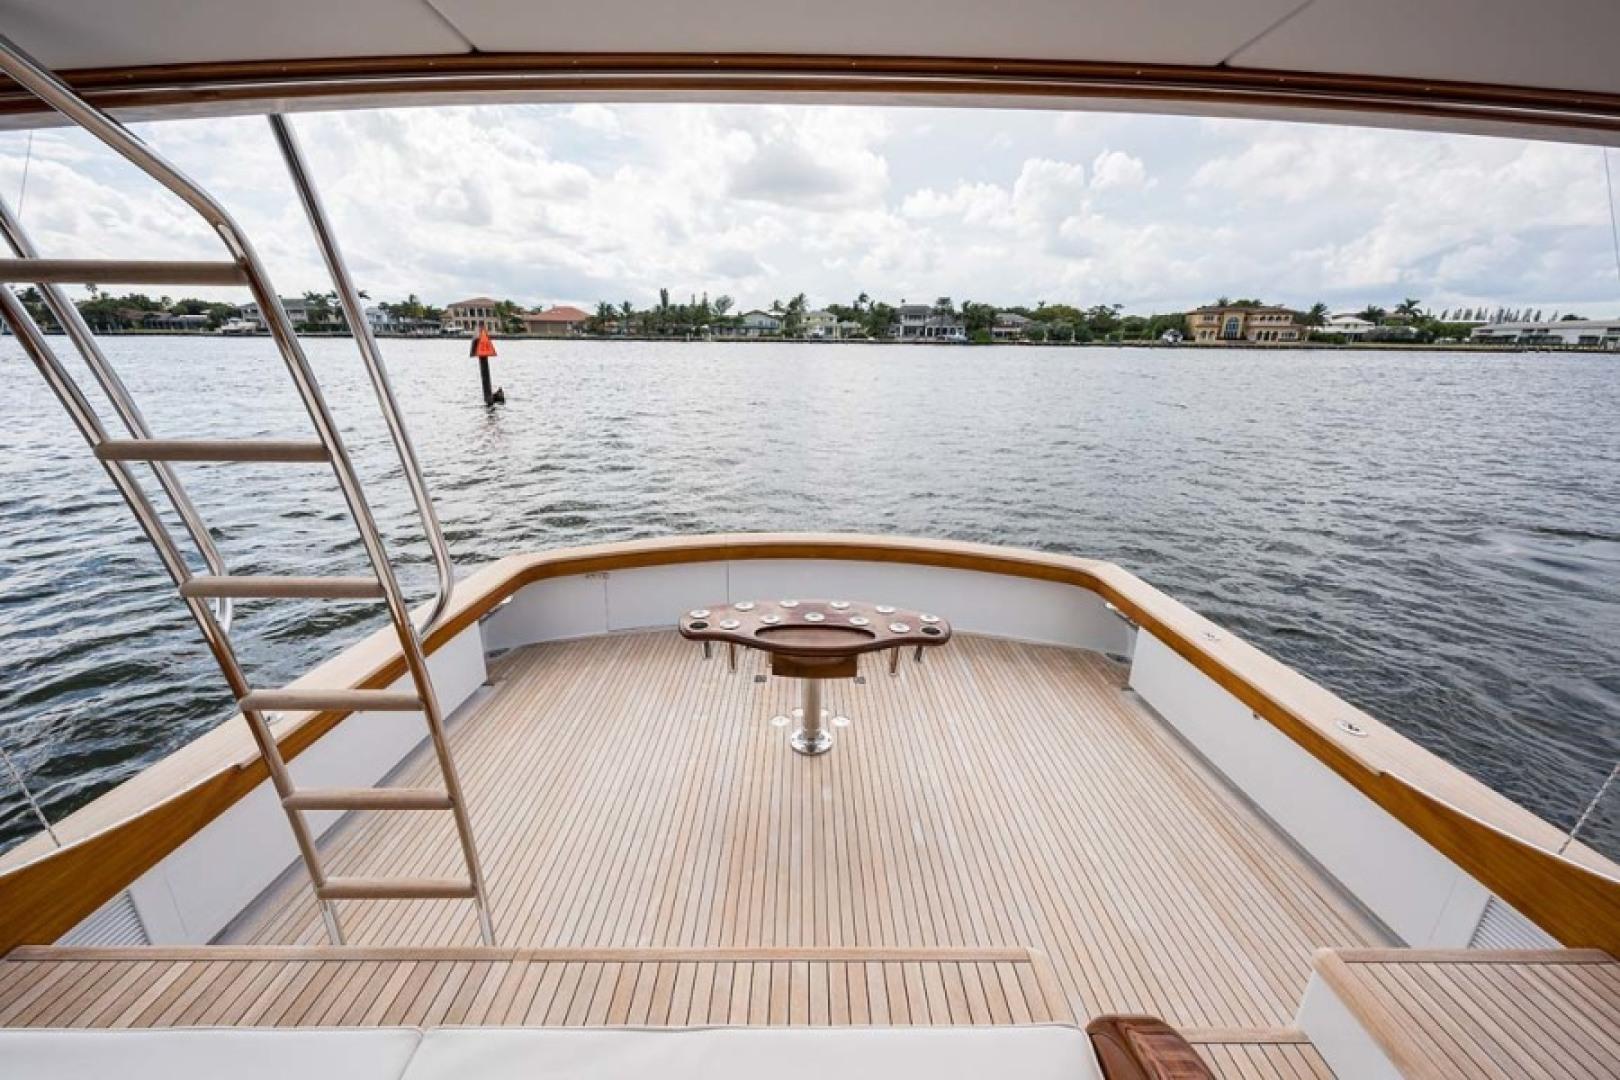 Rybovich-73 Convertible 2018-No Agenda North Palm Beach-Florida-United States-Cockpit View-1486376 | Thumbnail